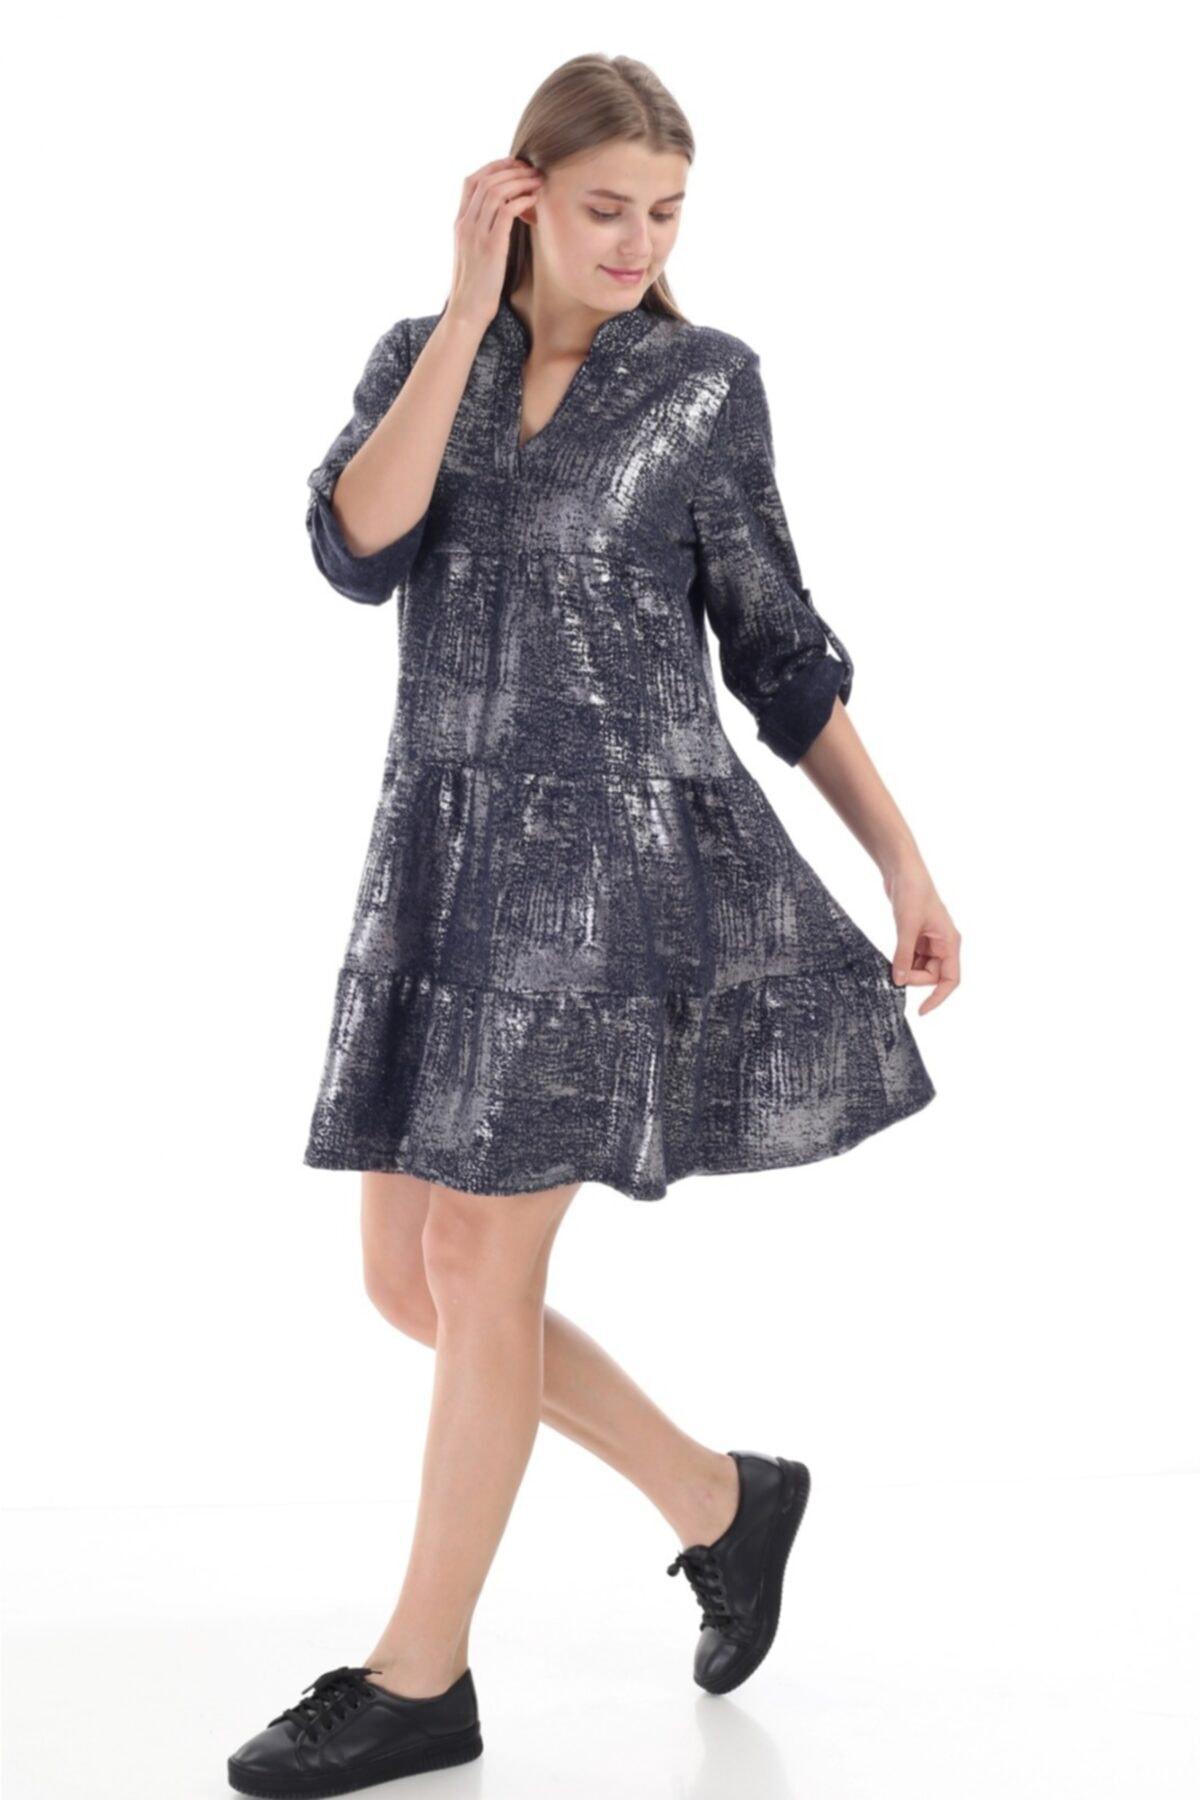 FD Fast Kadın Ithal Lacivert Sim Detaylı Italyan Model Elbise 16012 1